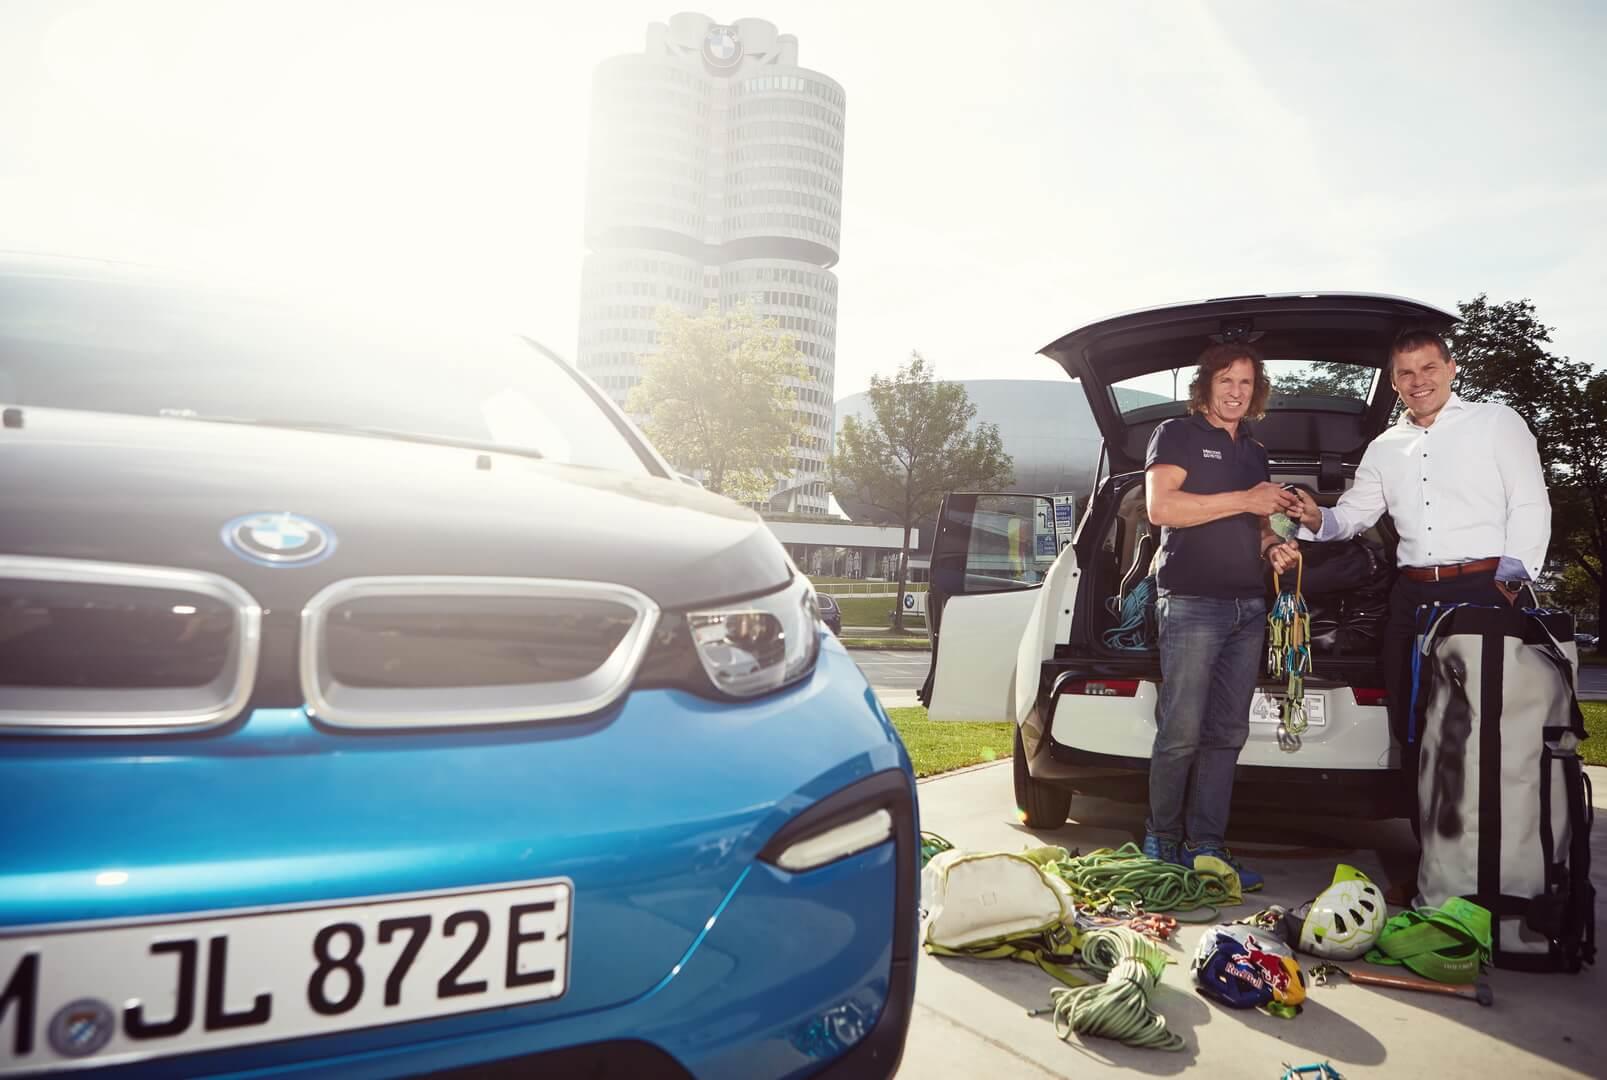 Роберт Ирлингер передал ключи отэлектромобилей BMW i3s авантюристам для участия втрехмесячной экспедиции «Отпобережья кпобережью»